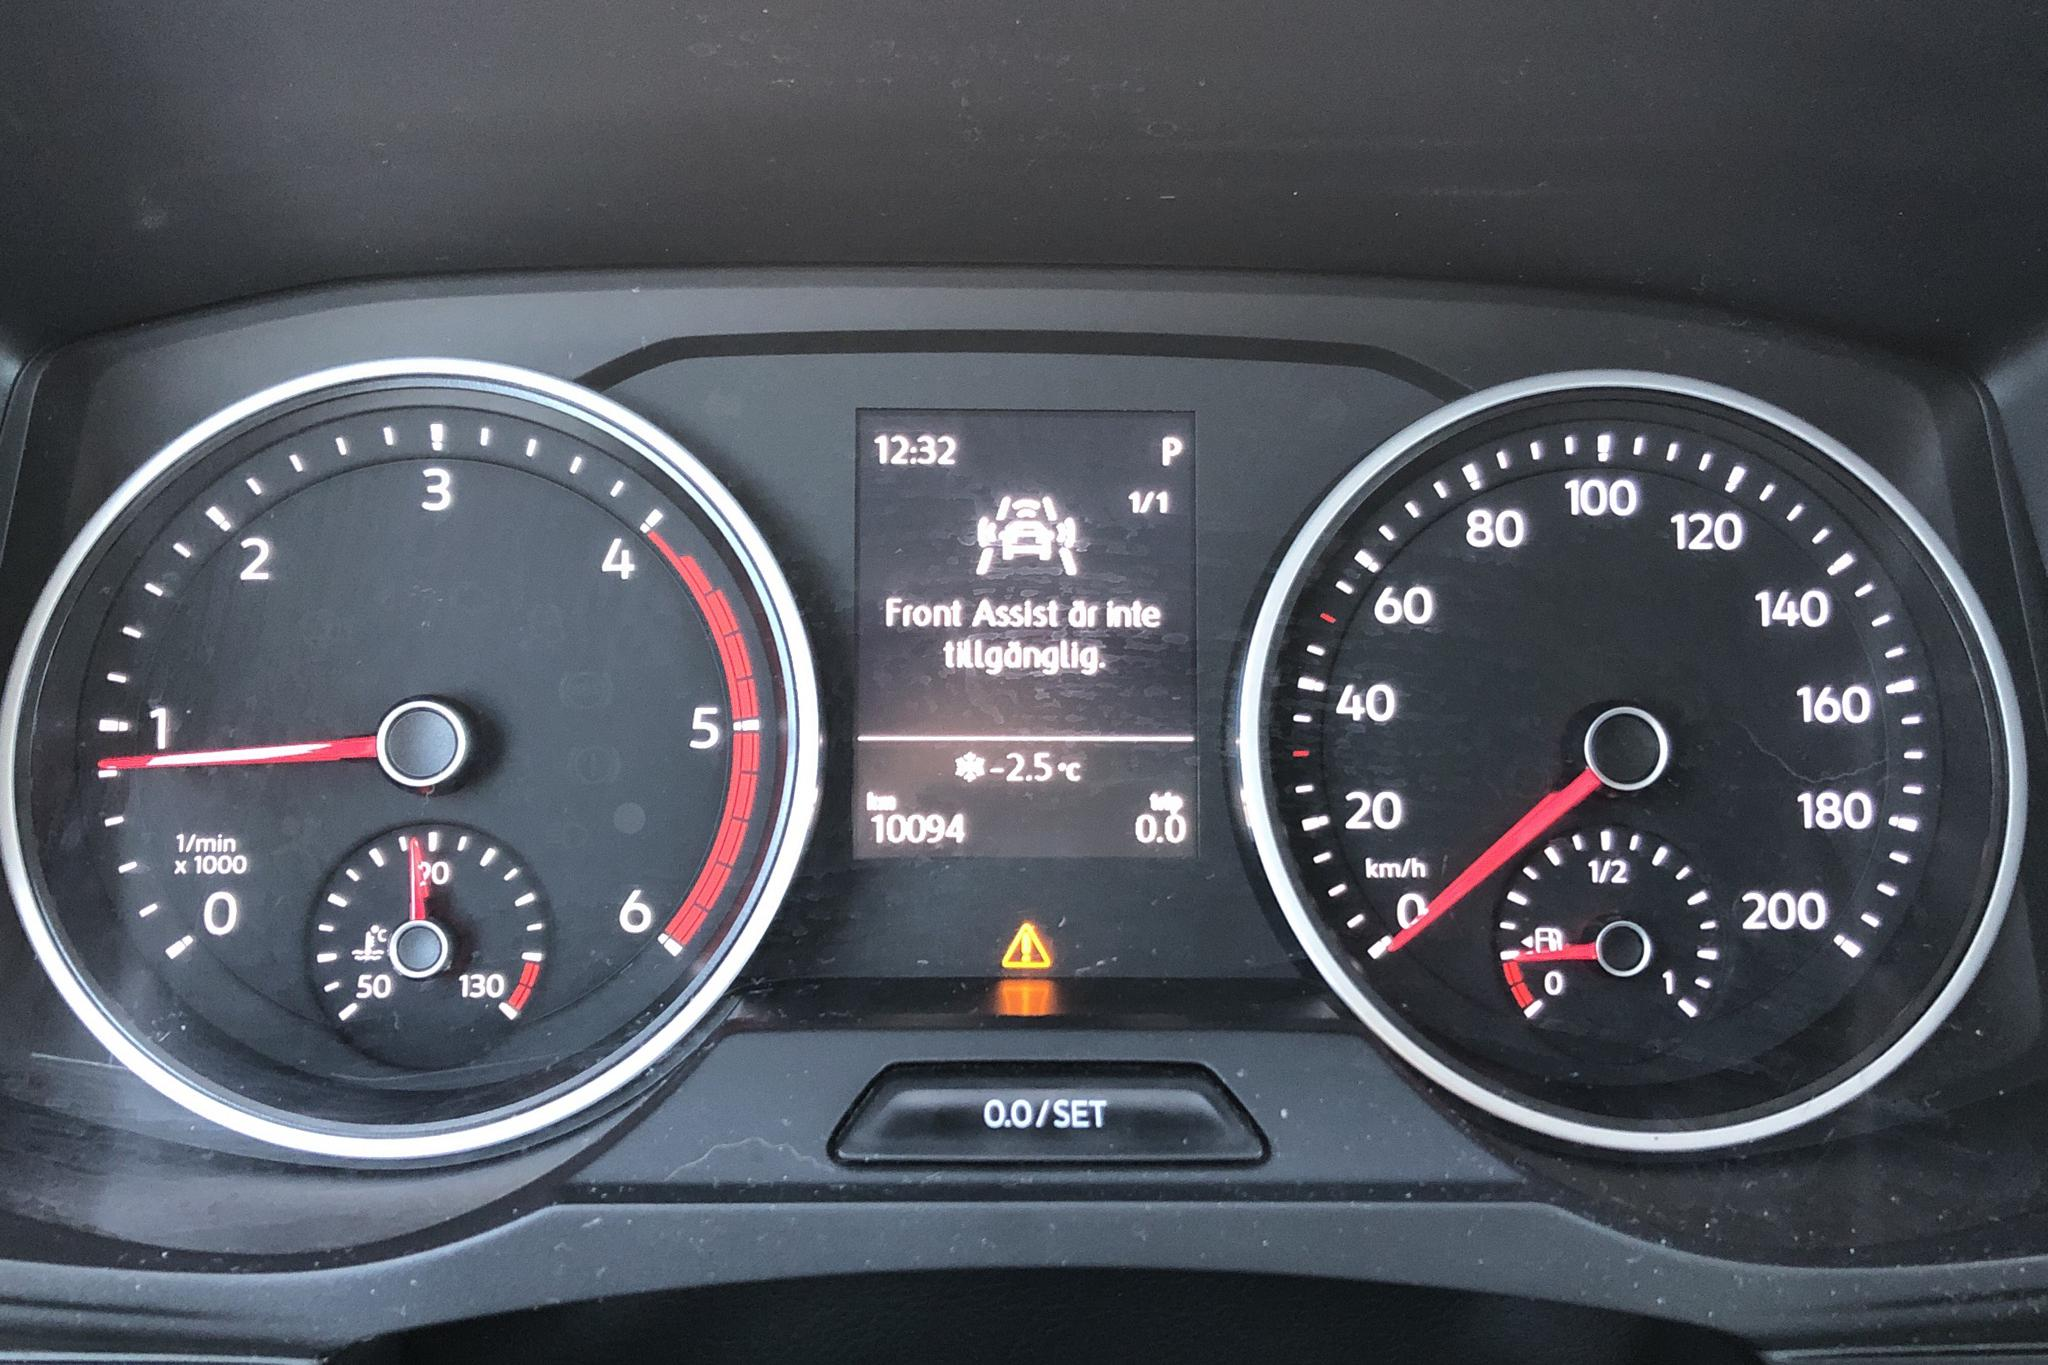 VW Crafter 35 2.0 TDI Dubbelhytt Långflak 4Motion (177hk) - 10 090 km - Automatic - black - 2020